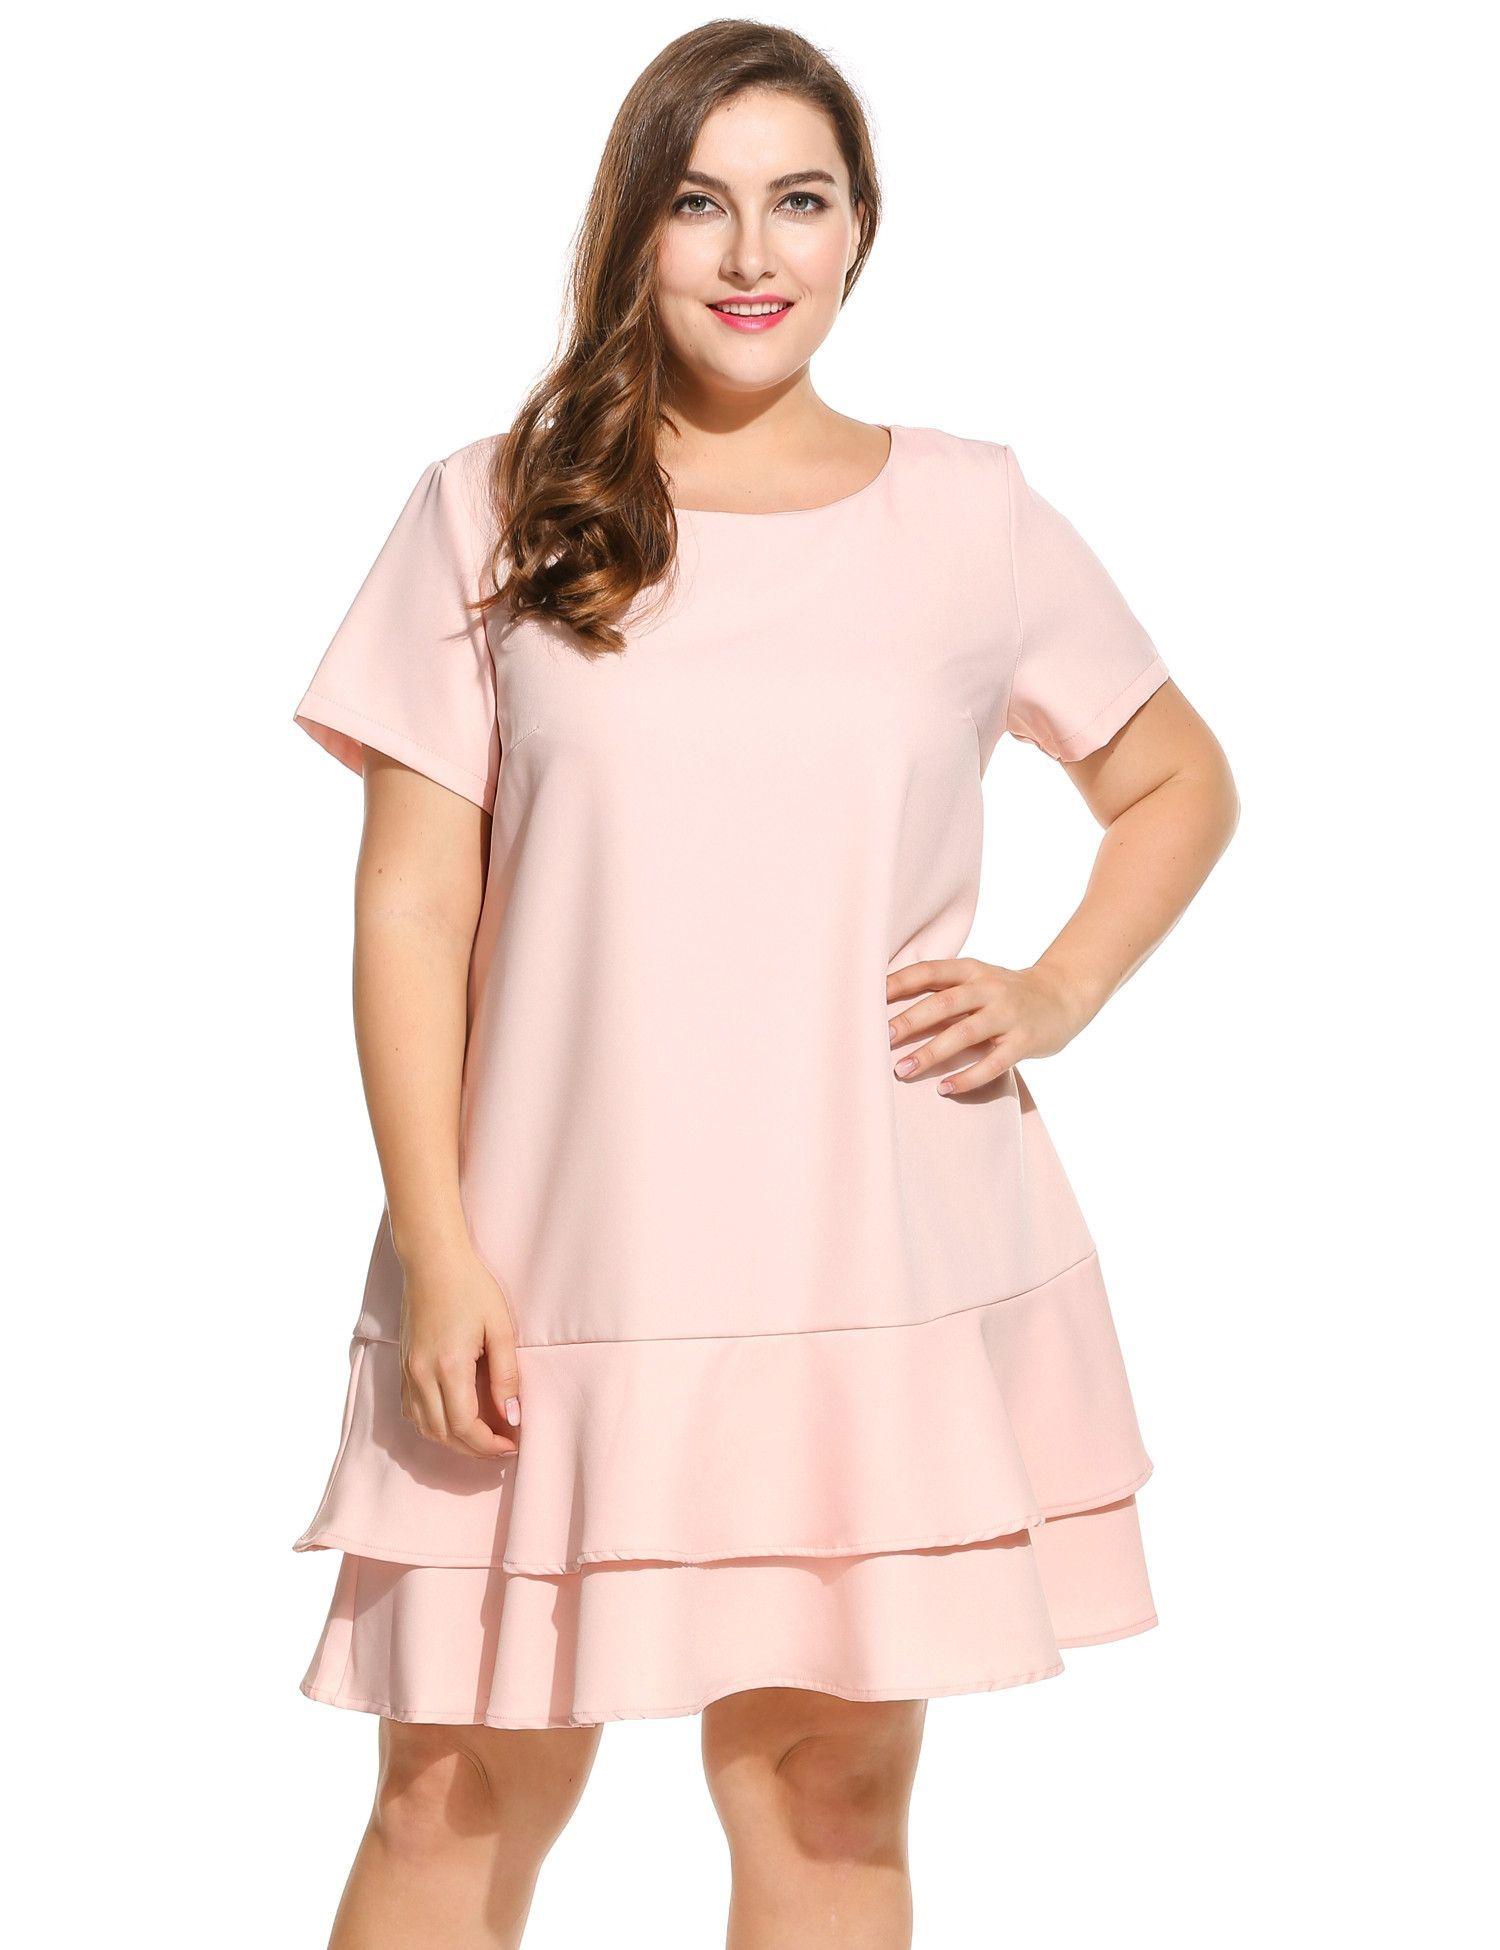 Women short sleeve solid double layer ruffles hem dress plus size